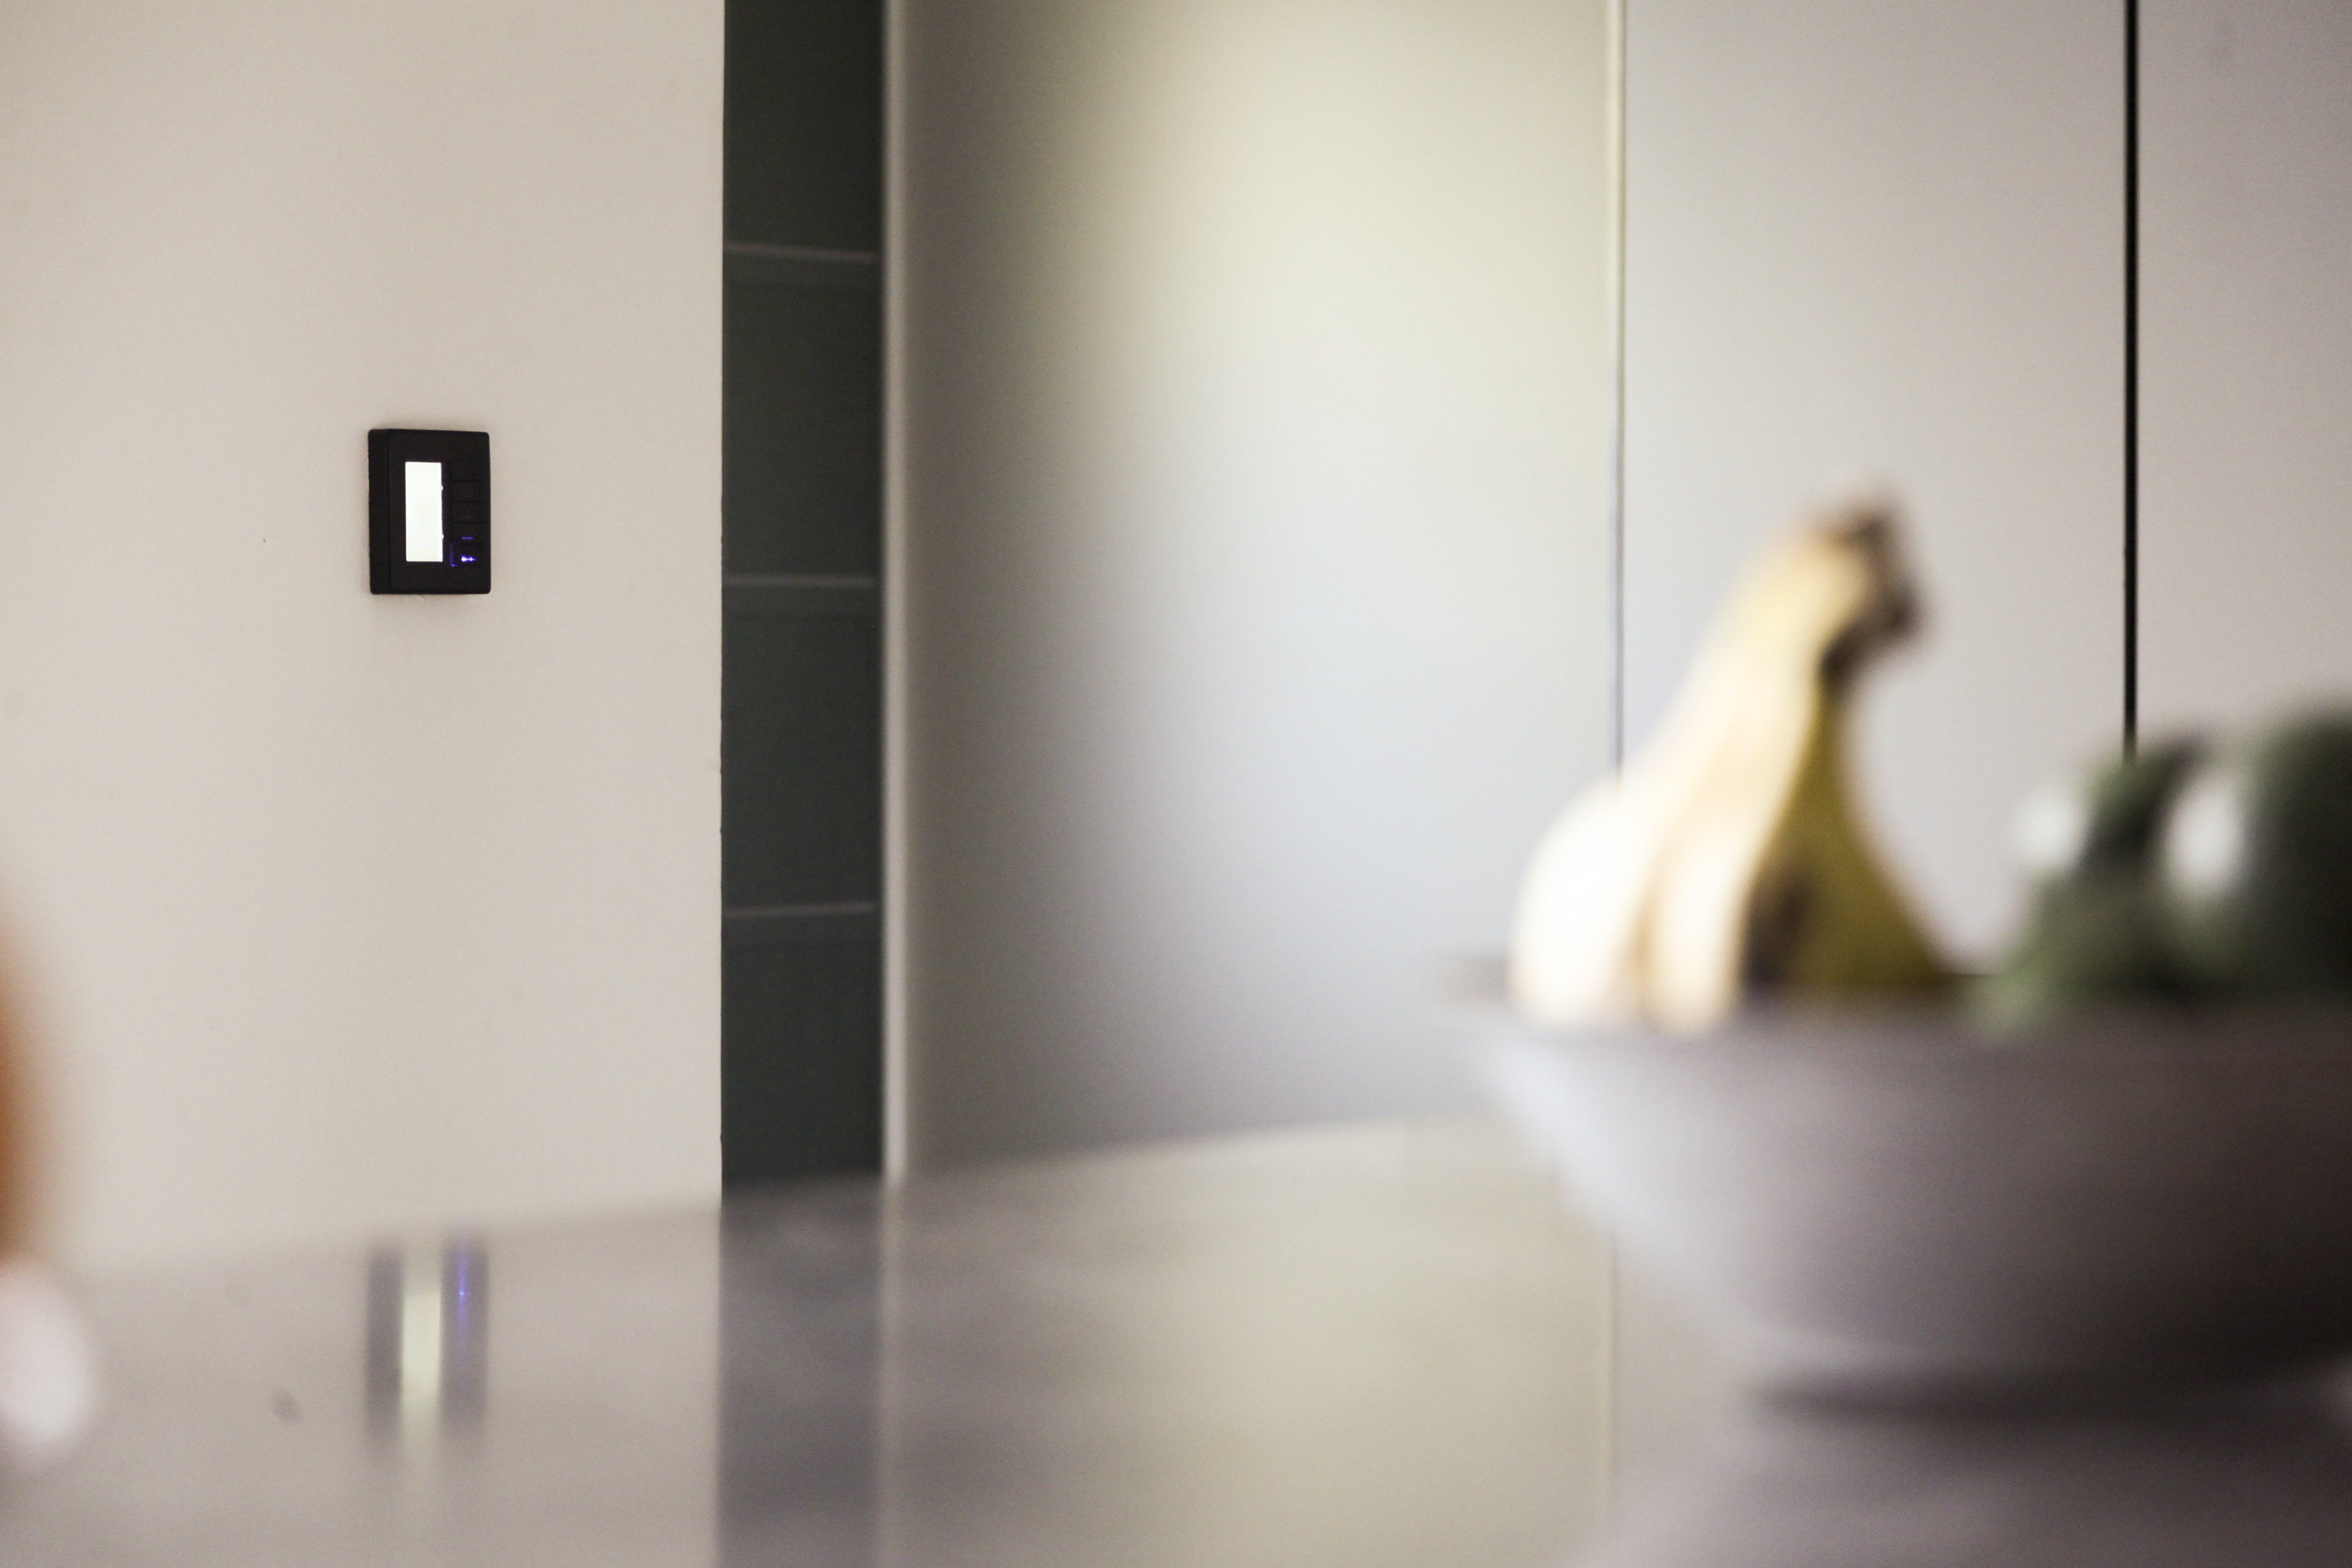 Free stock photo of kitchen, home, banana, control panel